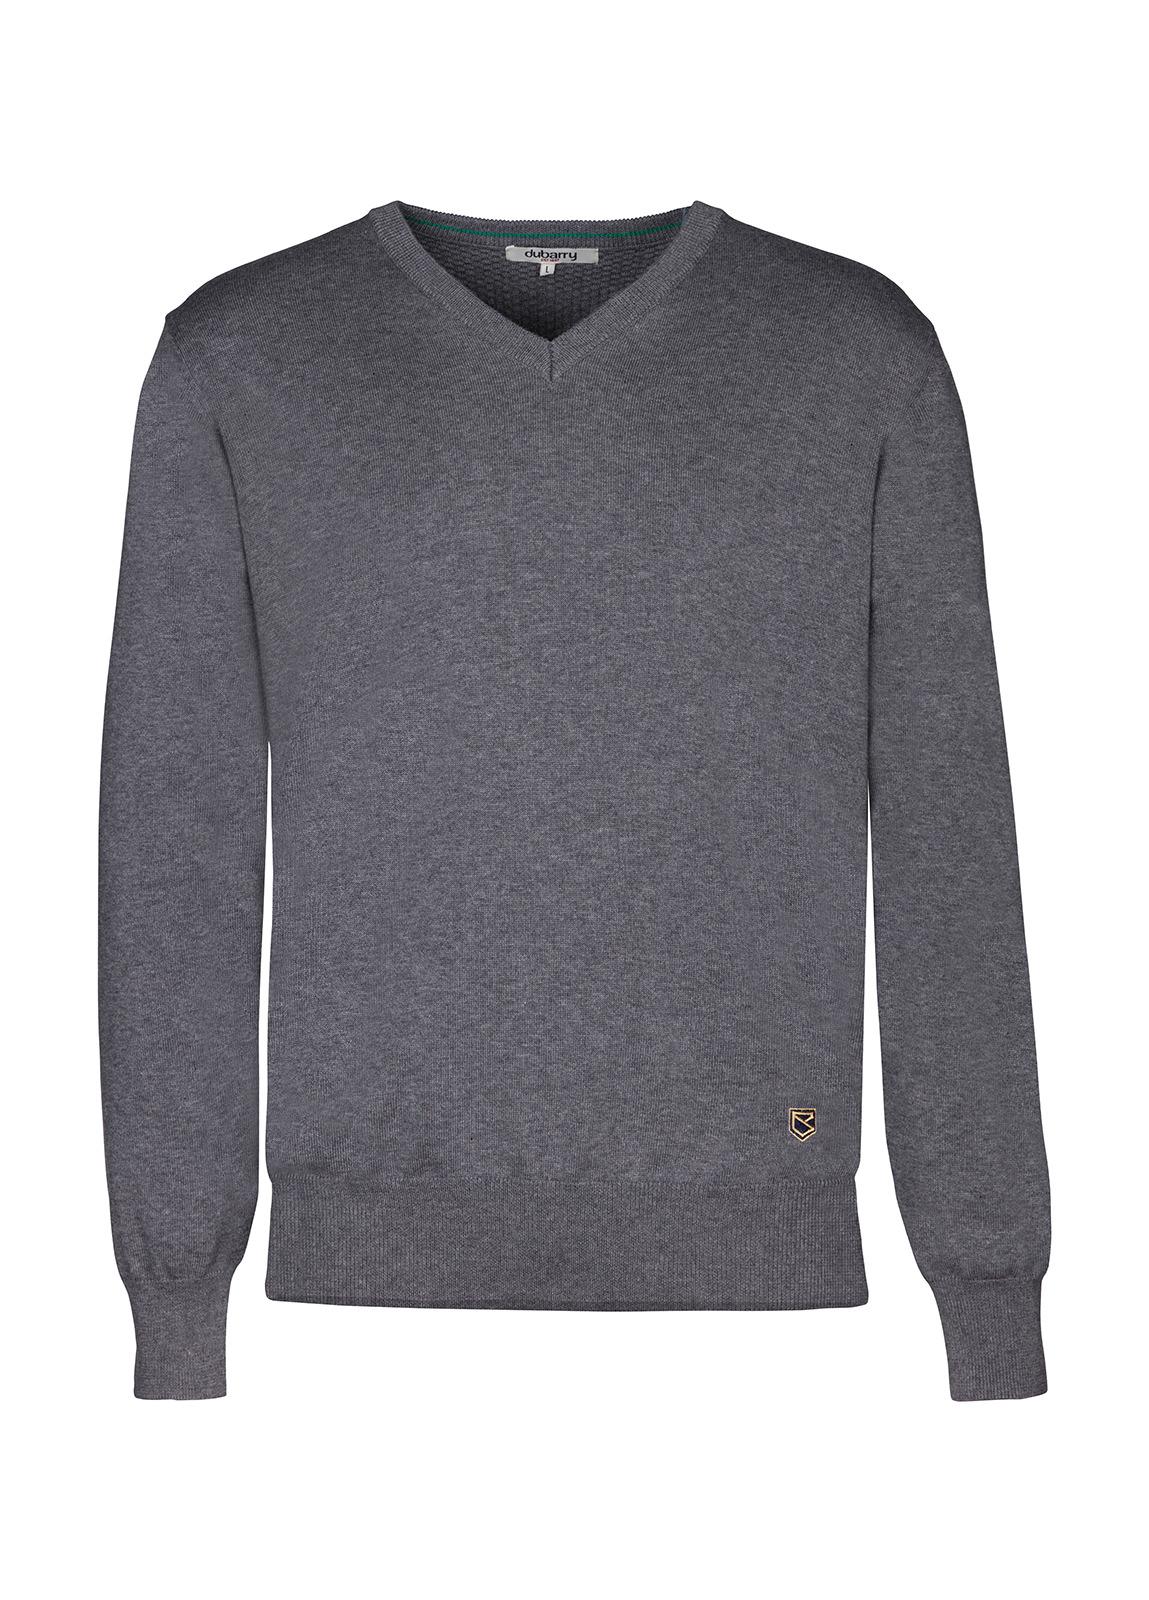 Dubarry_ Carson Sweater - Light Grey_Image_2